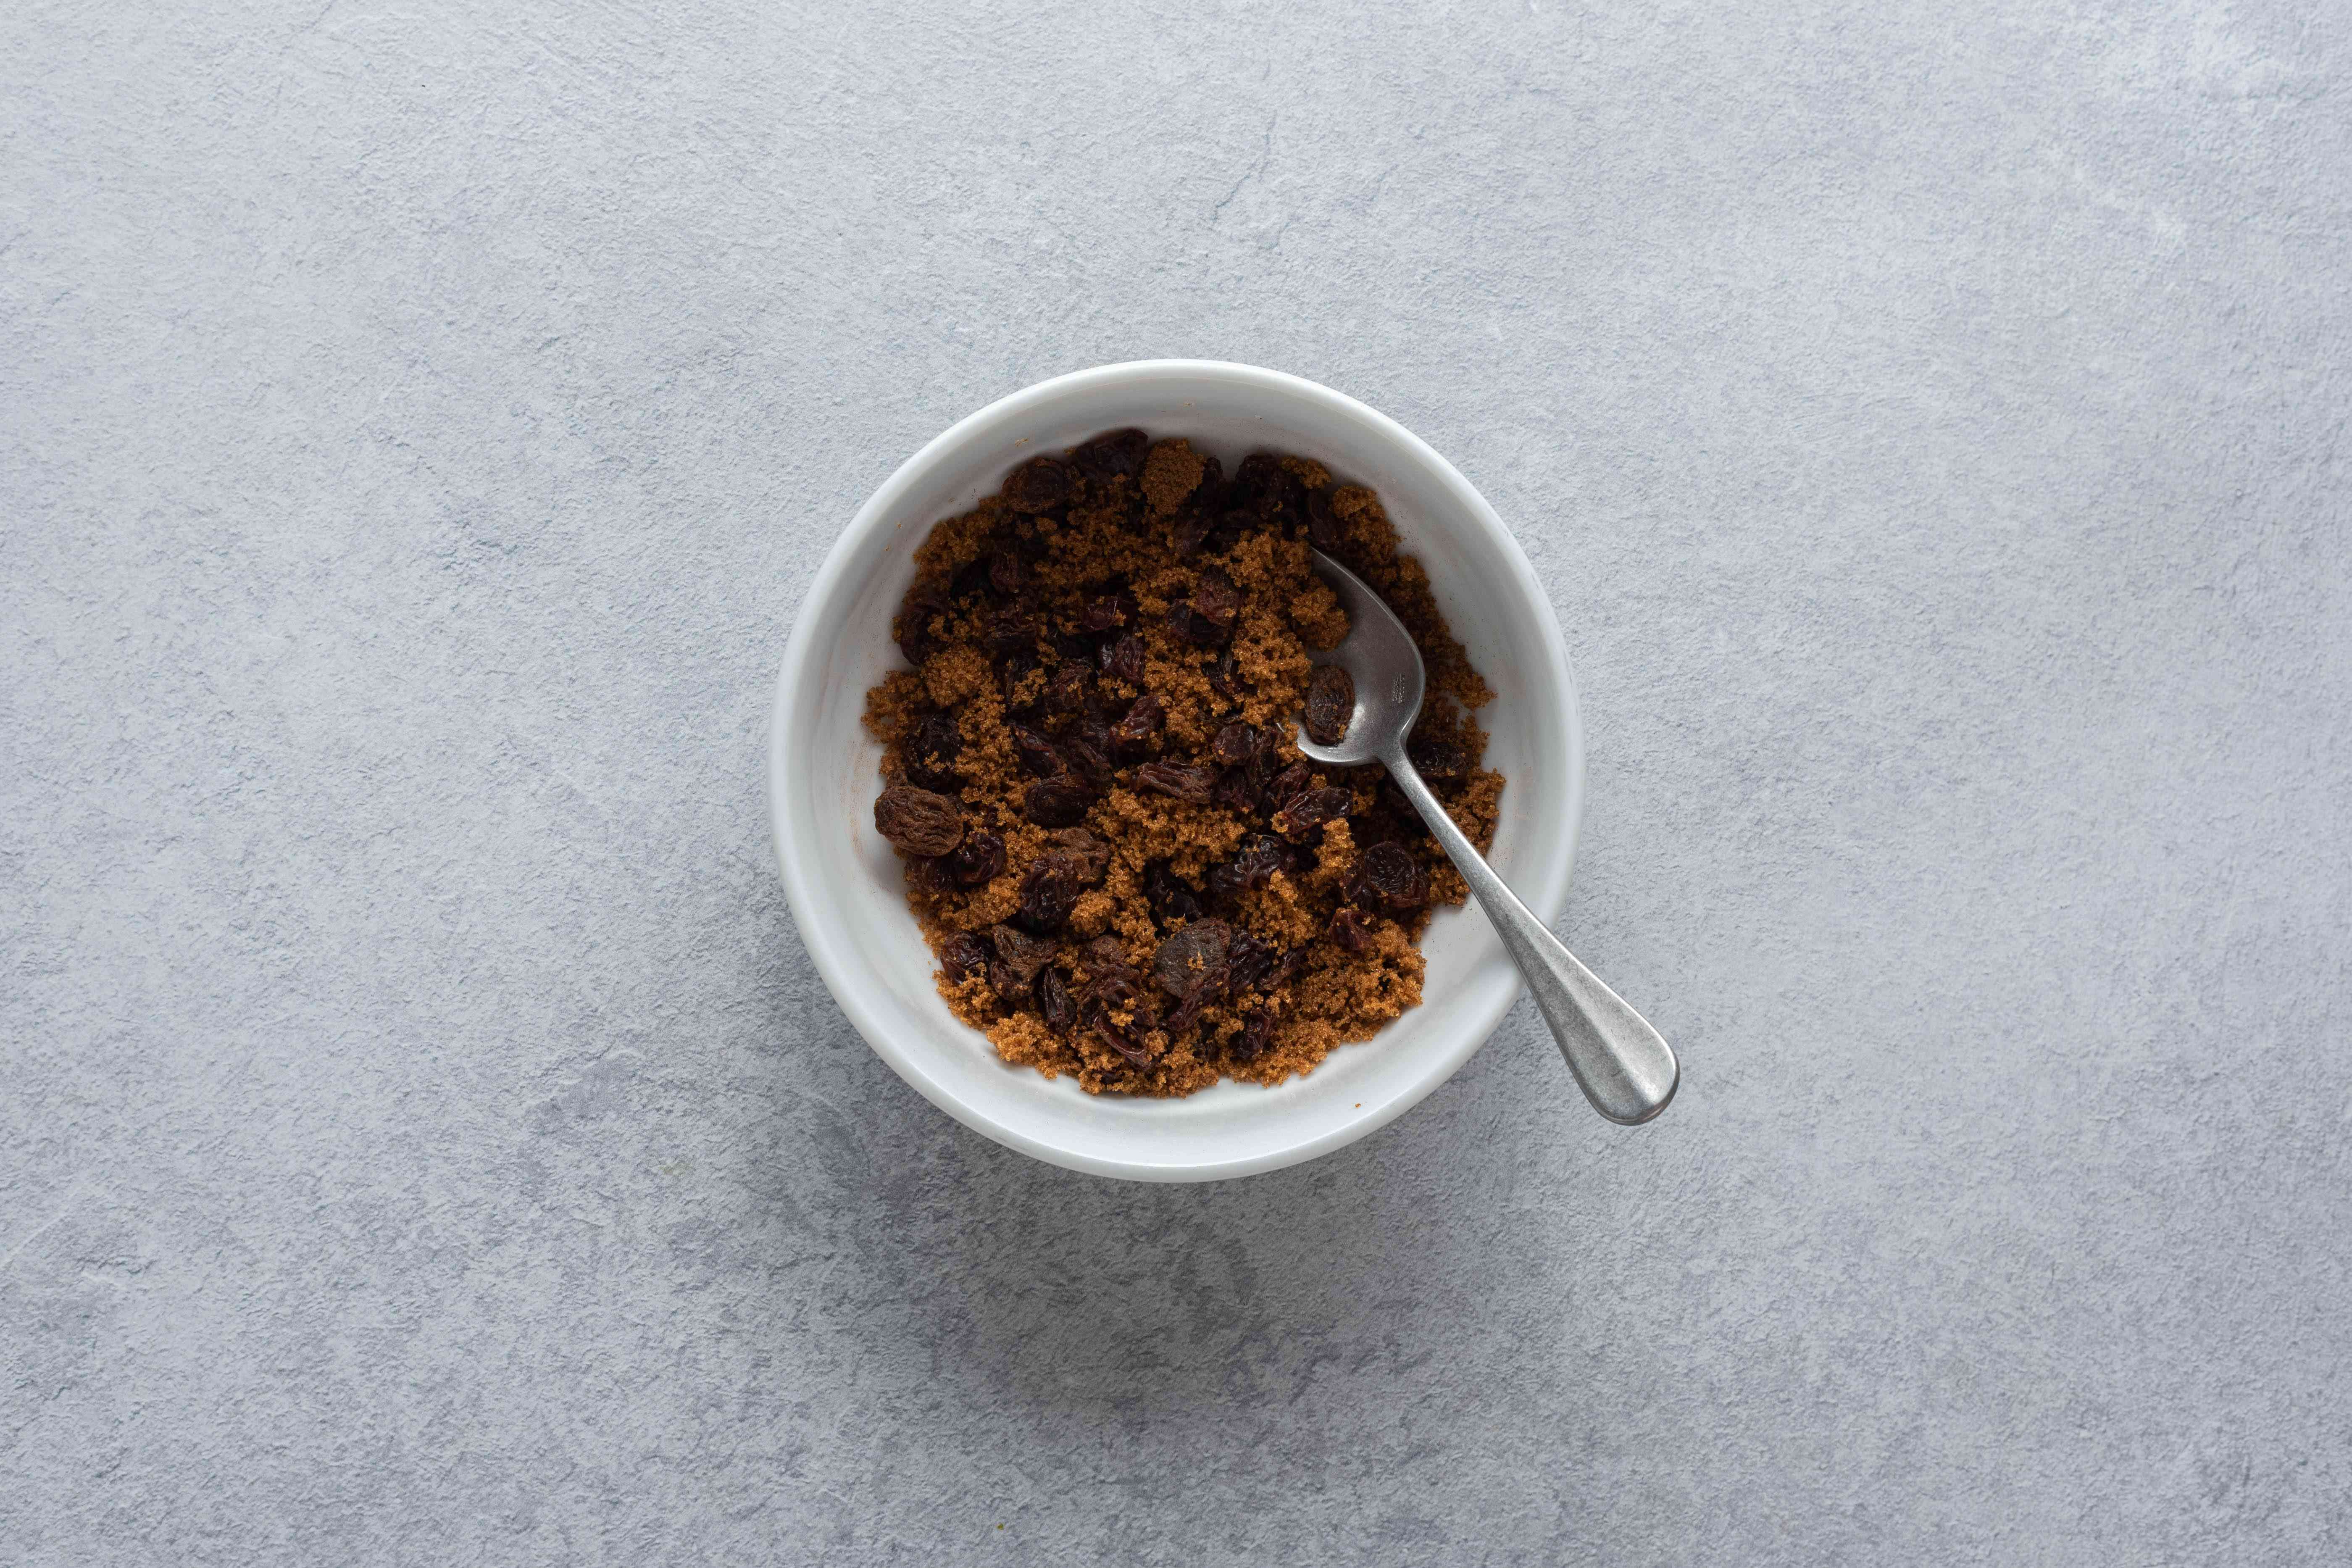 Stir the raisins, brown sugar, and cinnamon together